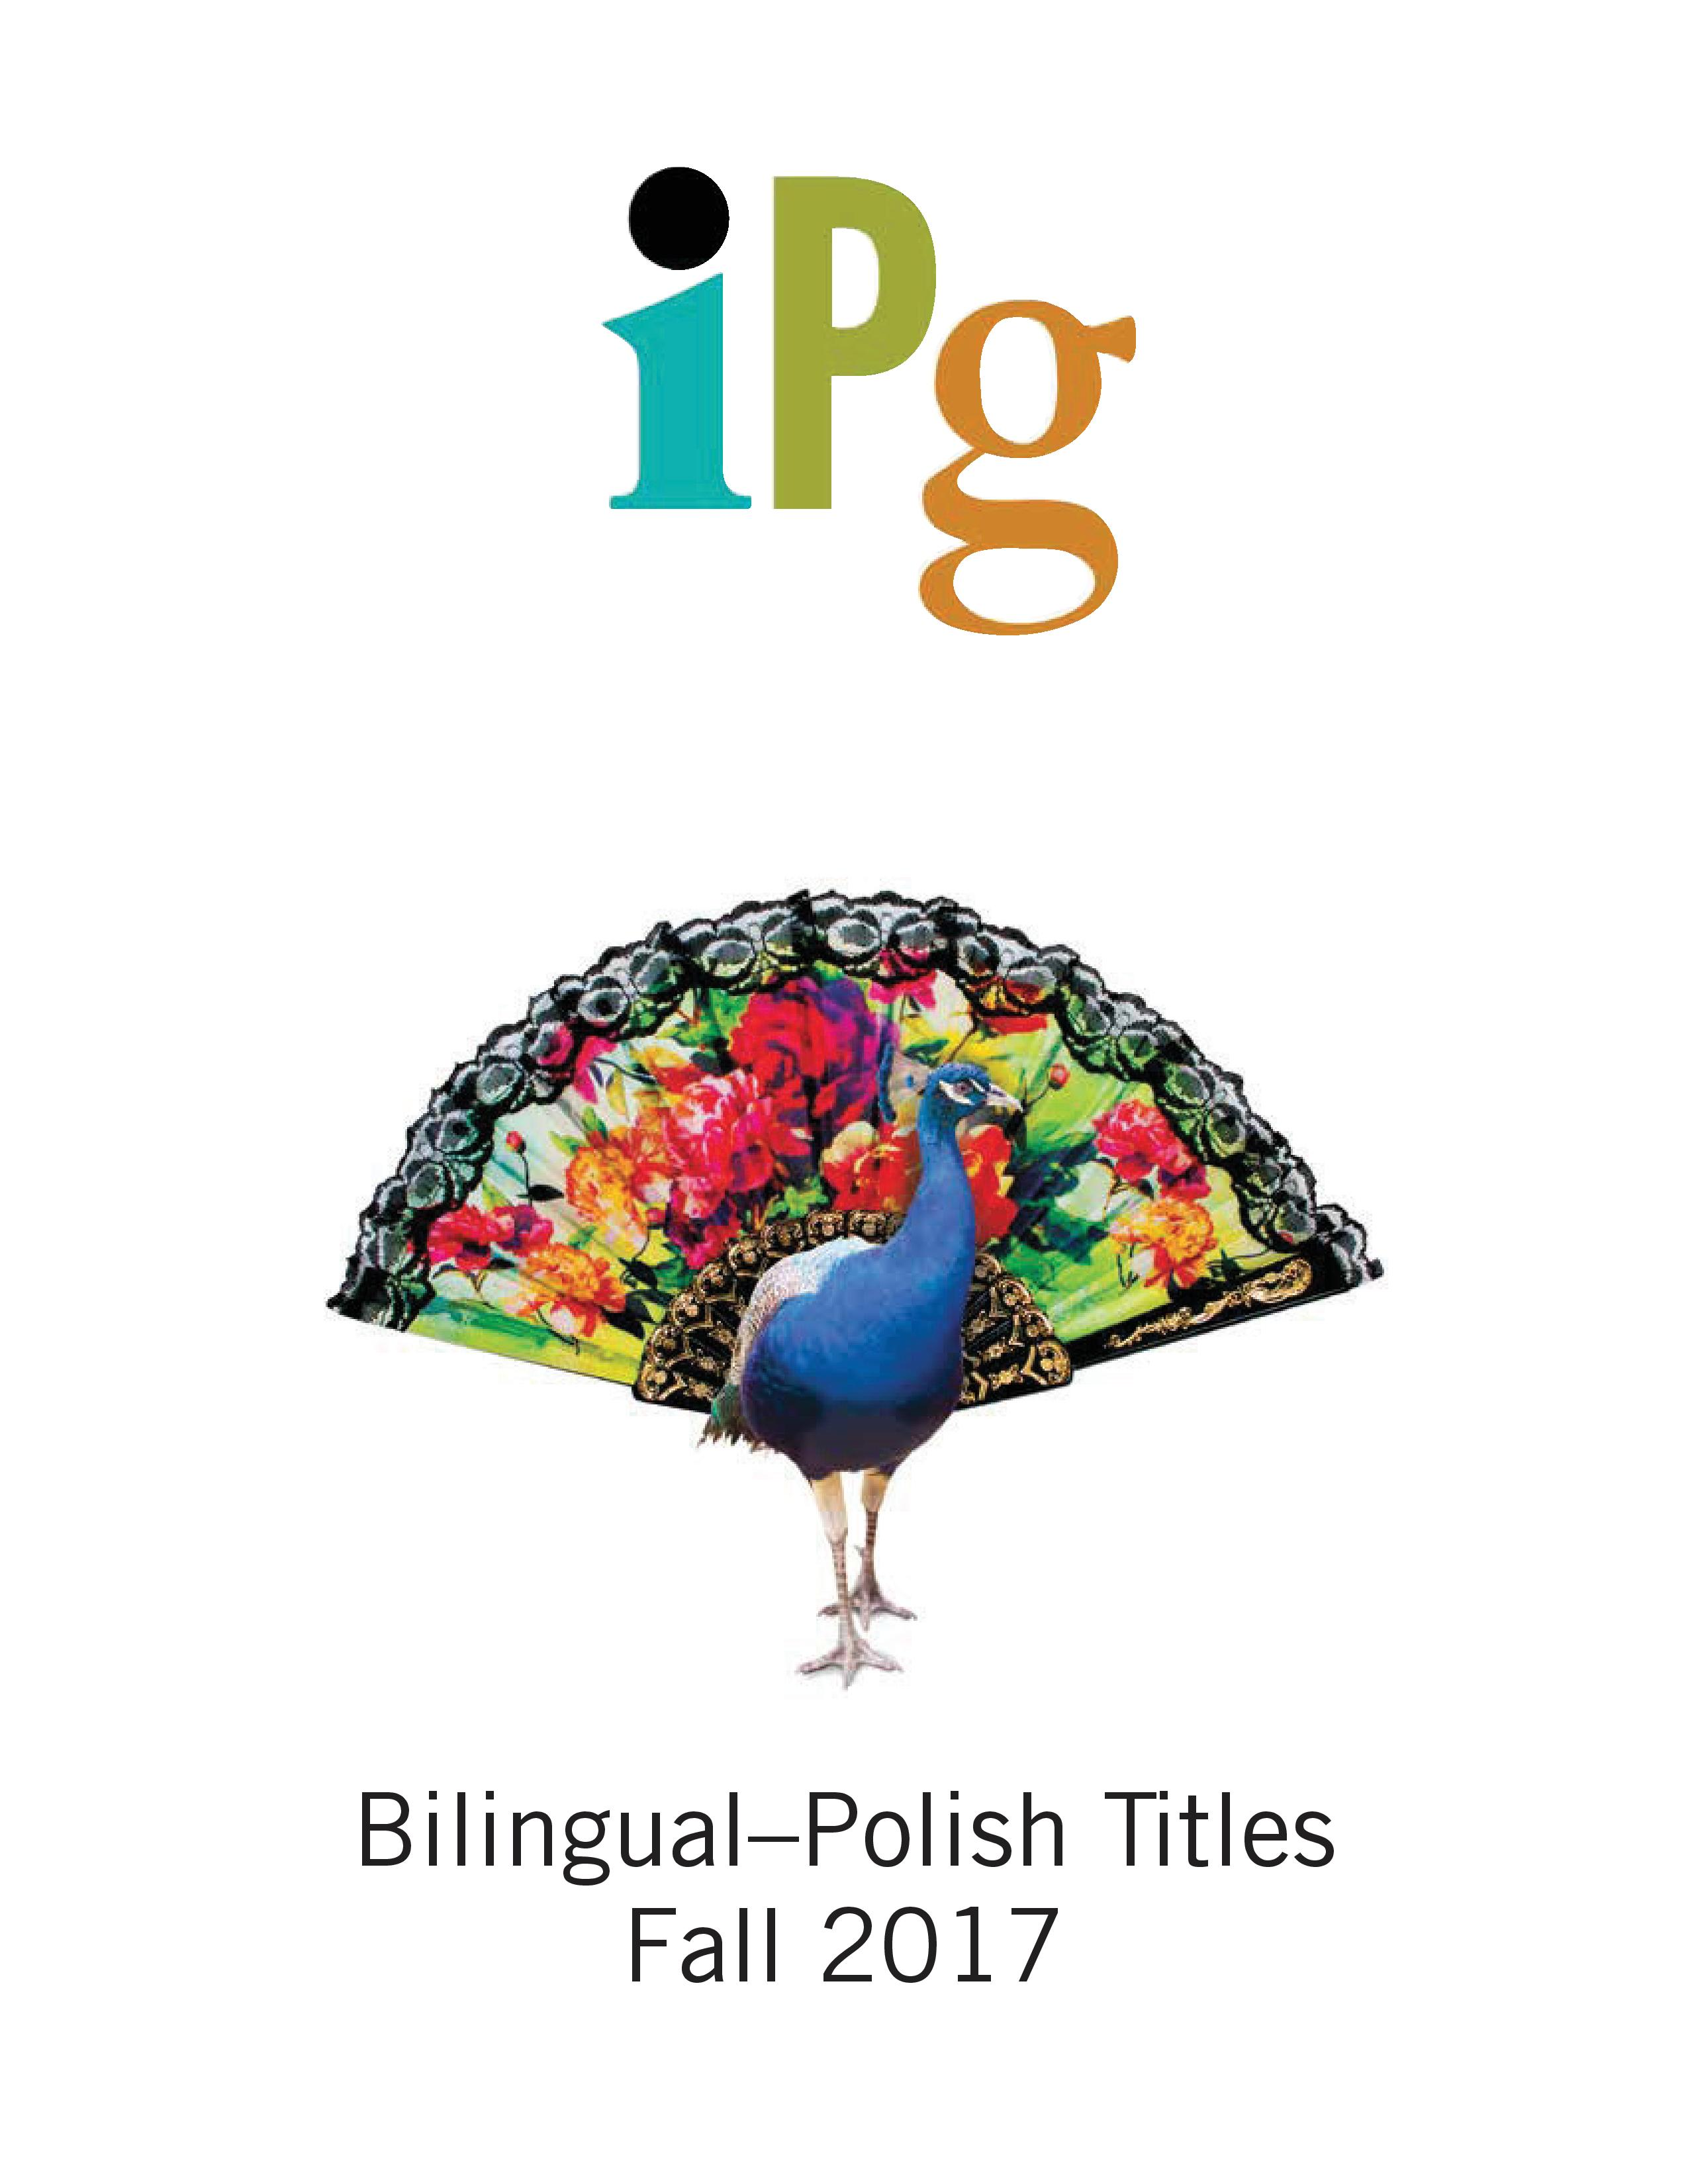 Bilingual Polish Titles